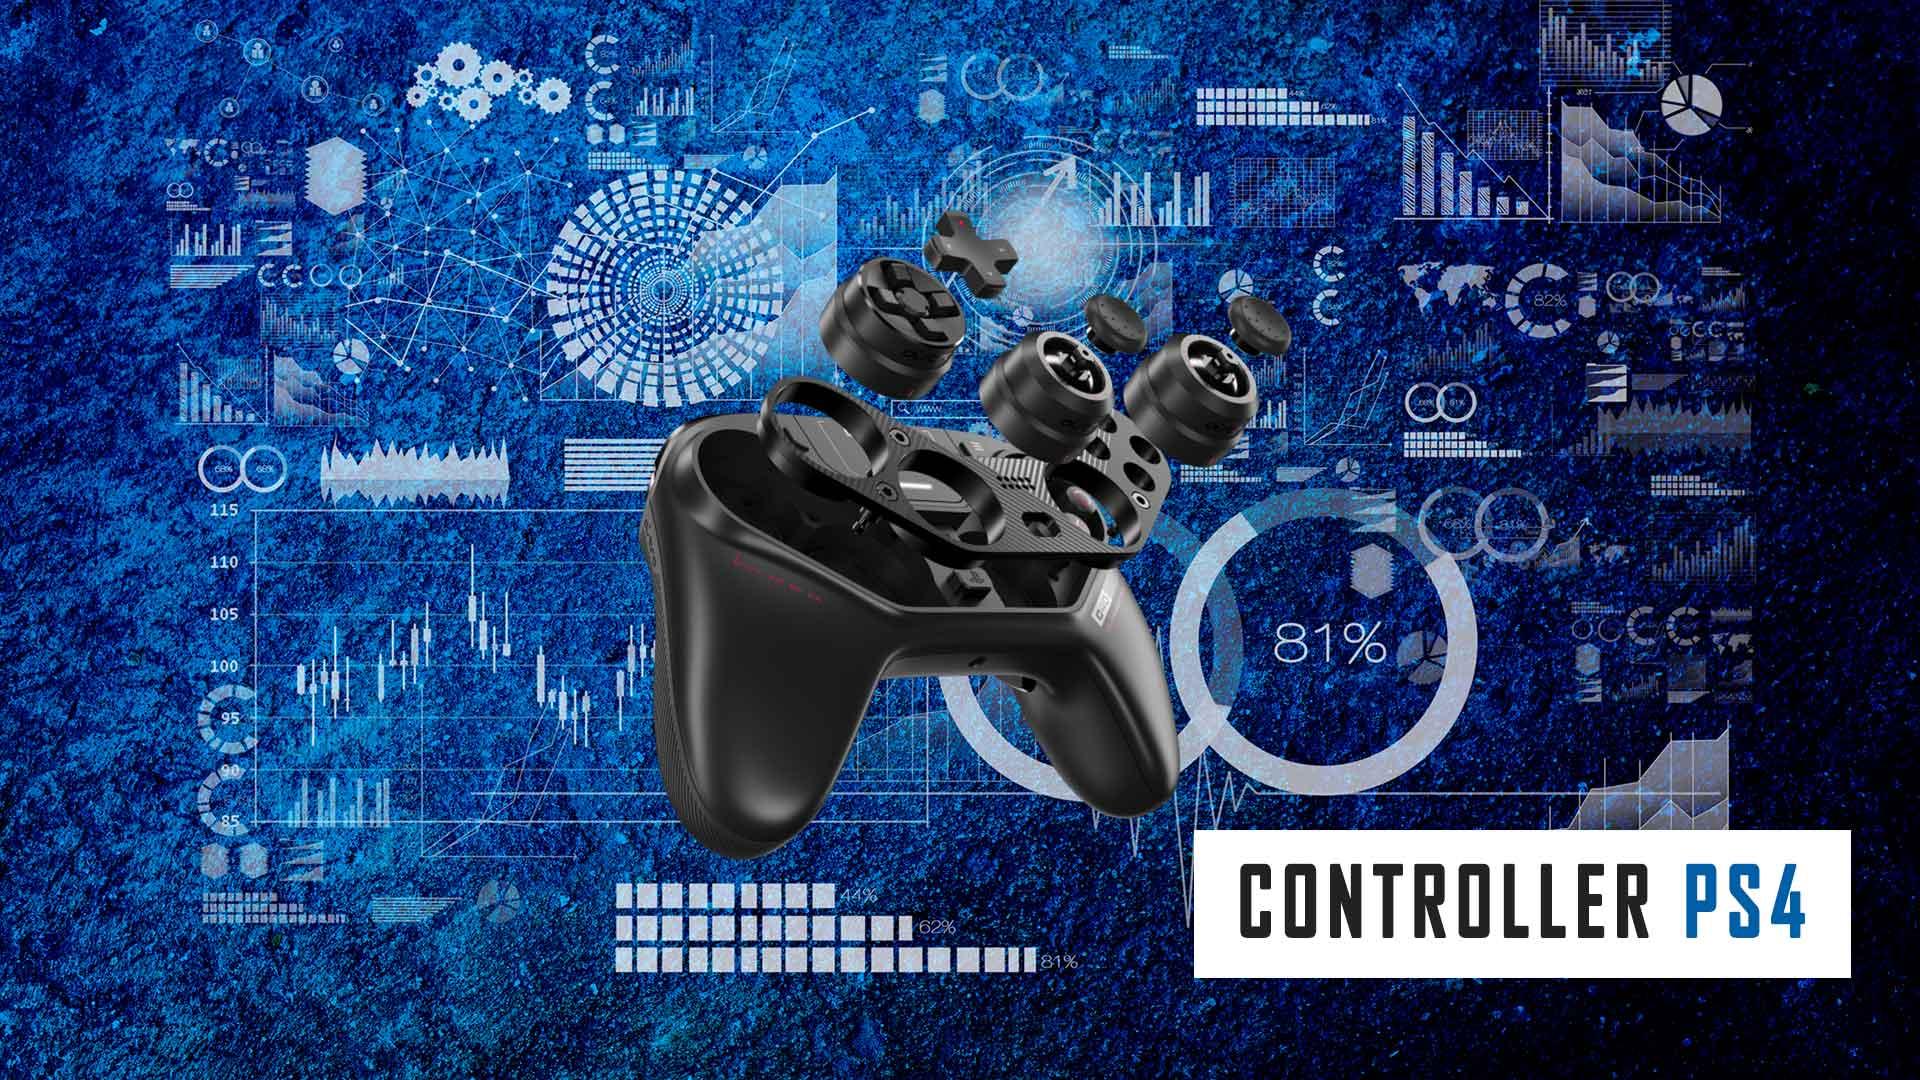 controller joystick joypad ps4 i migliori